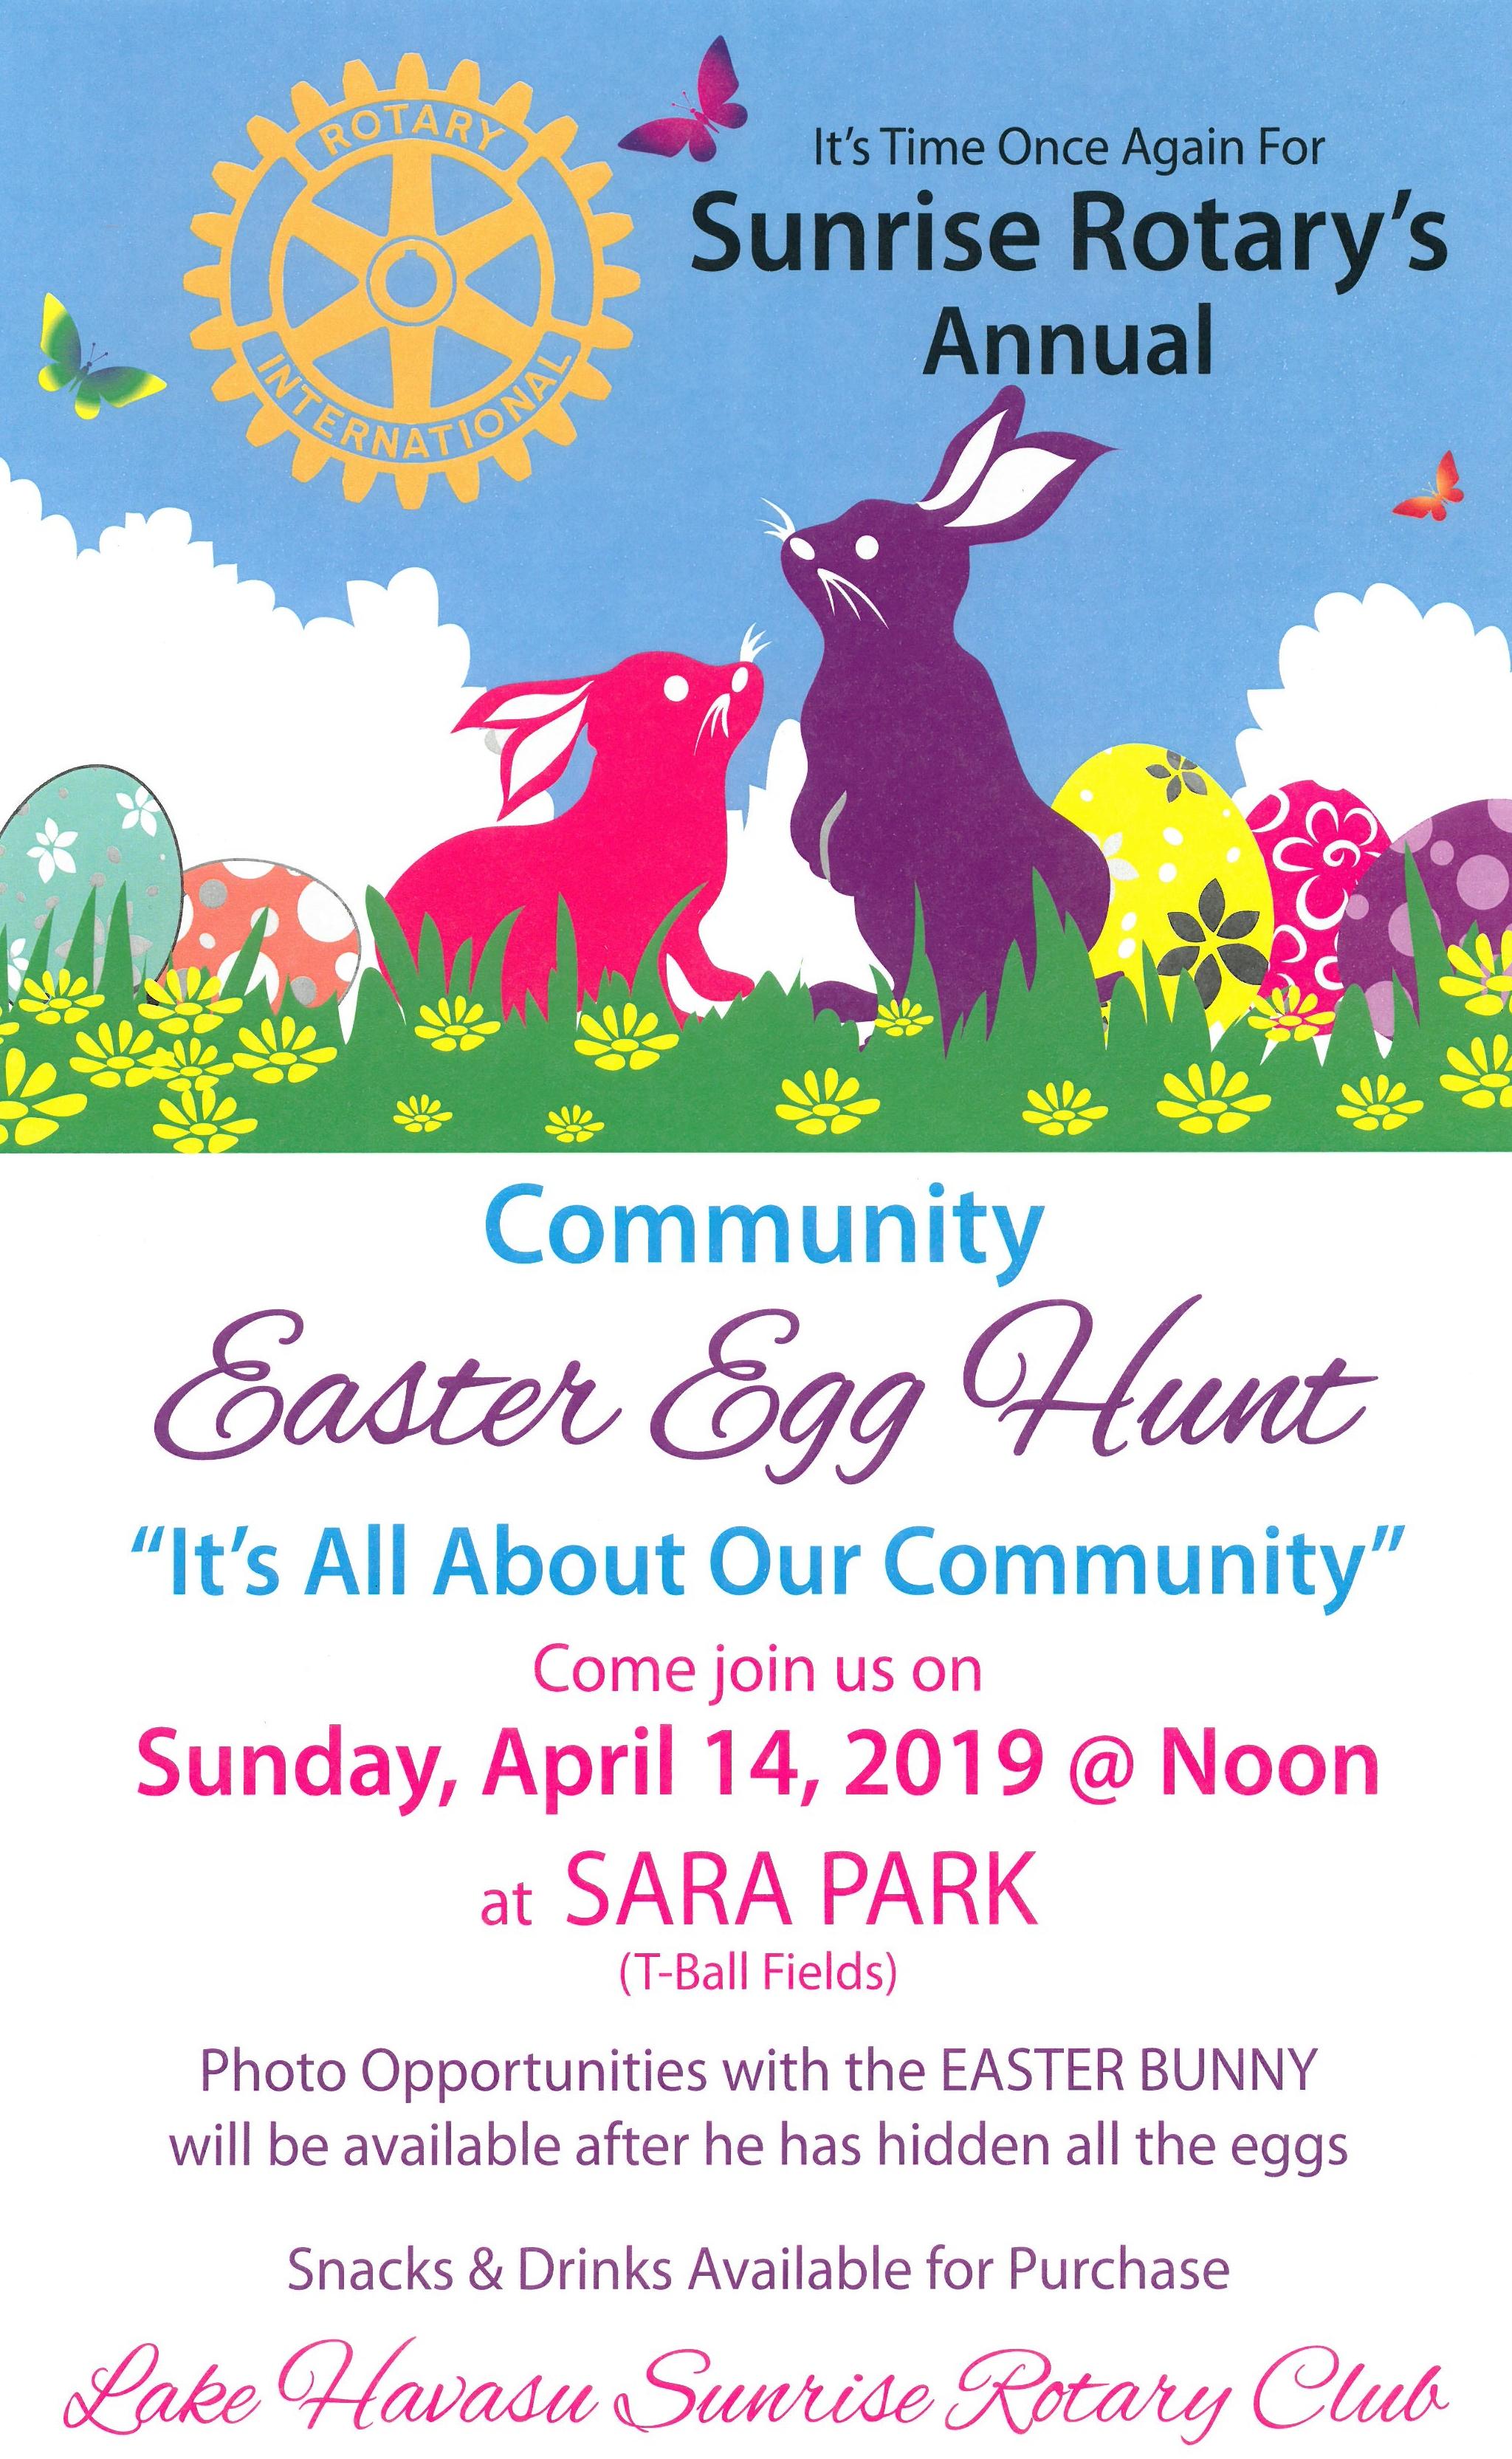 Lake Havasu Sunrise Rotary Club Annual Easter Egg Hunt